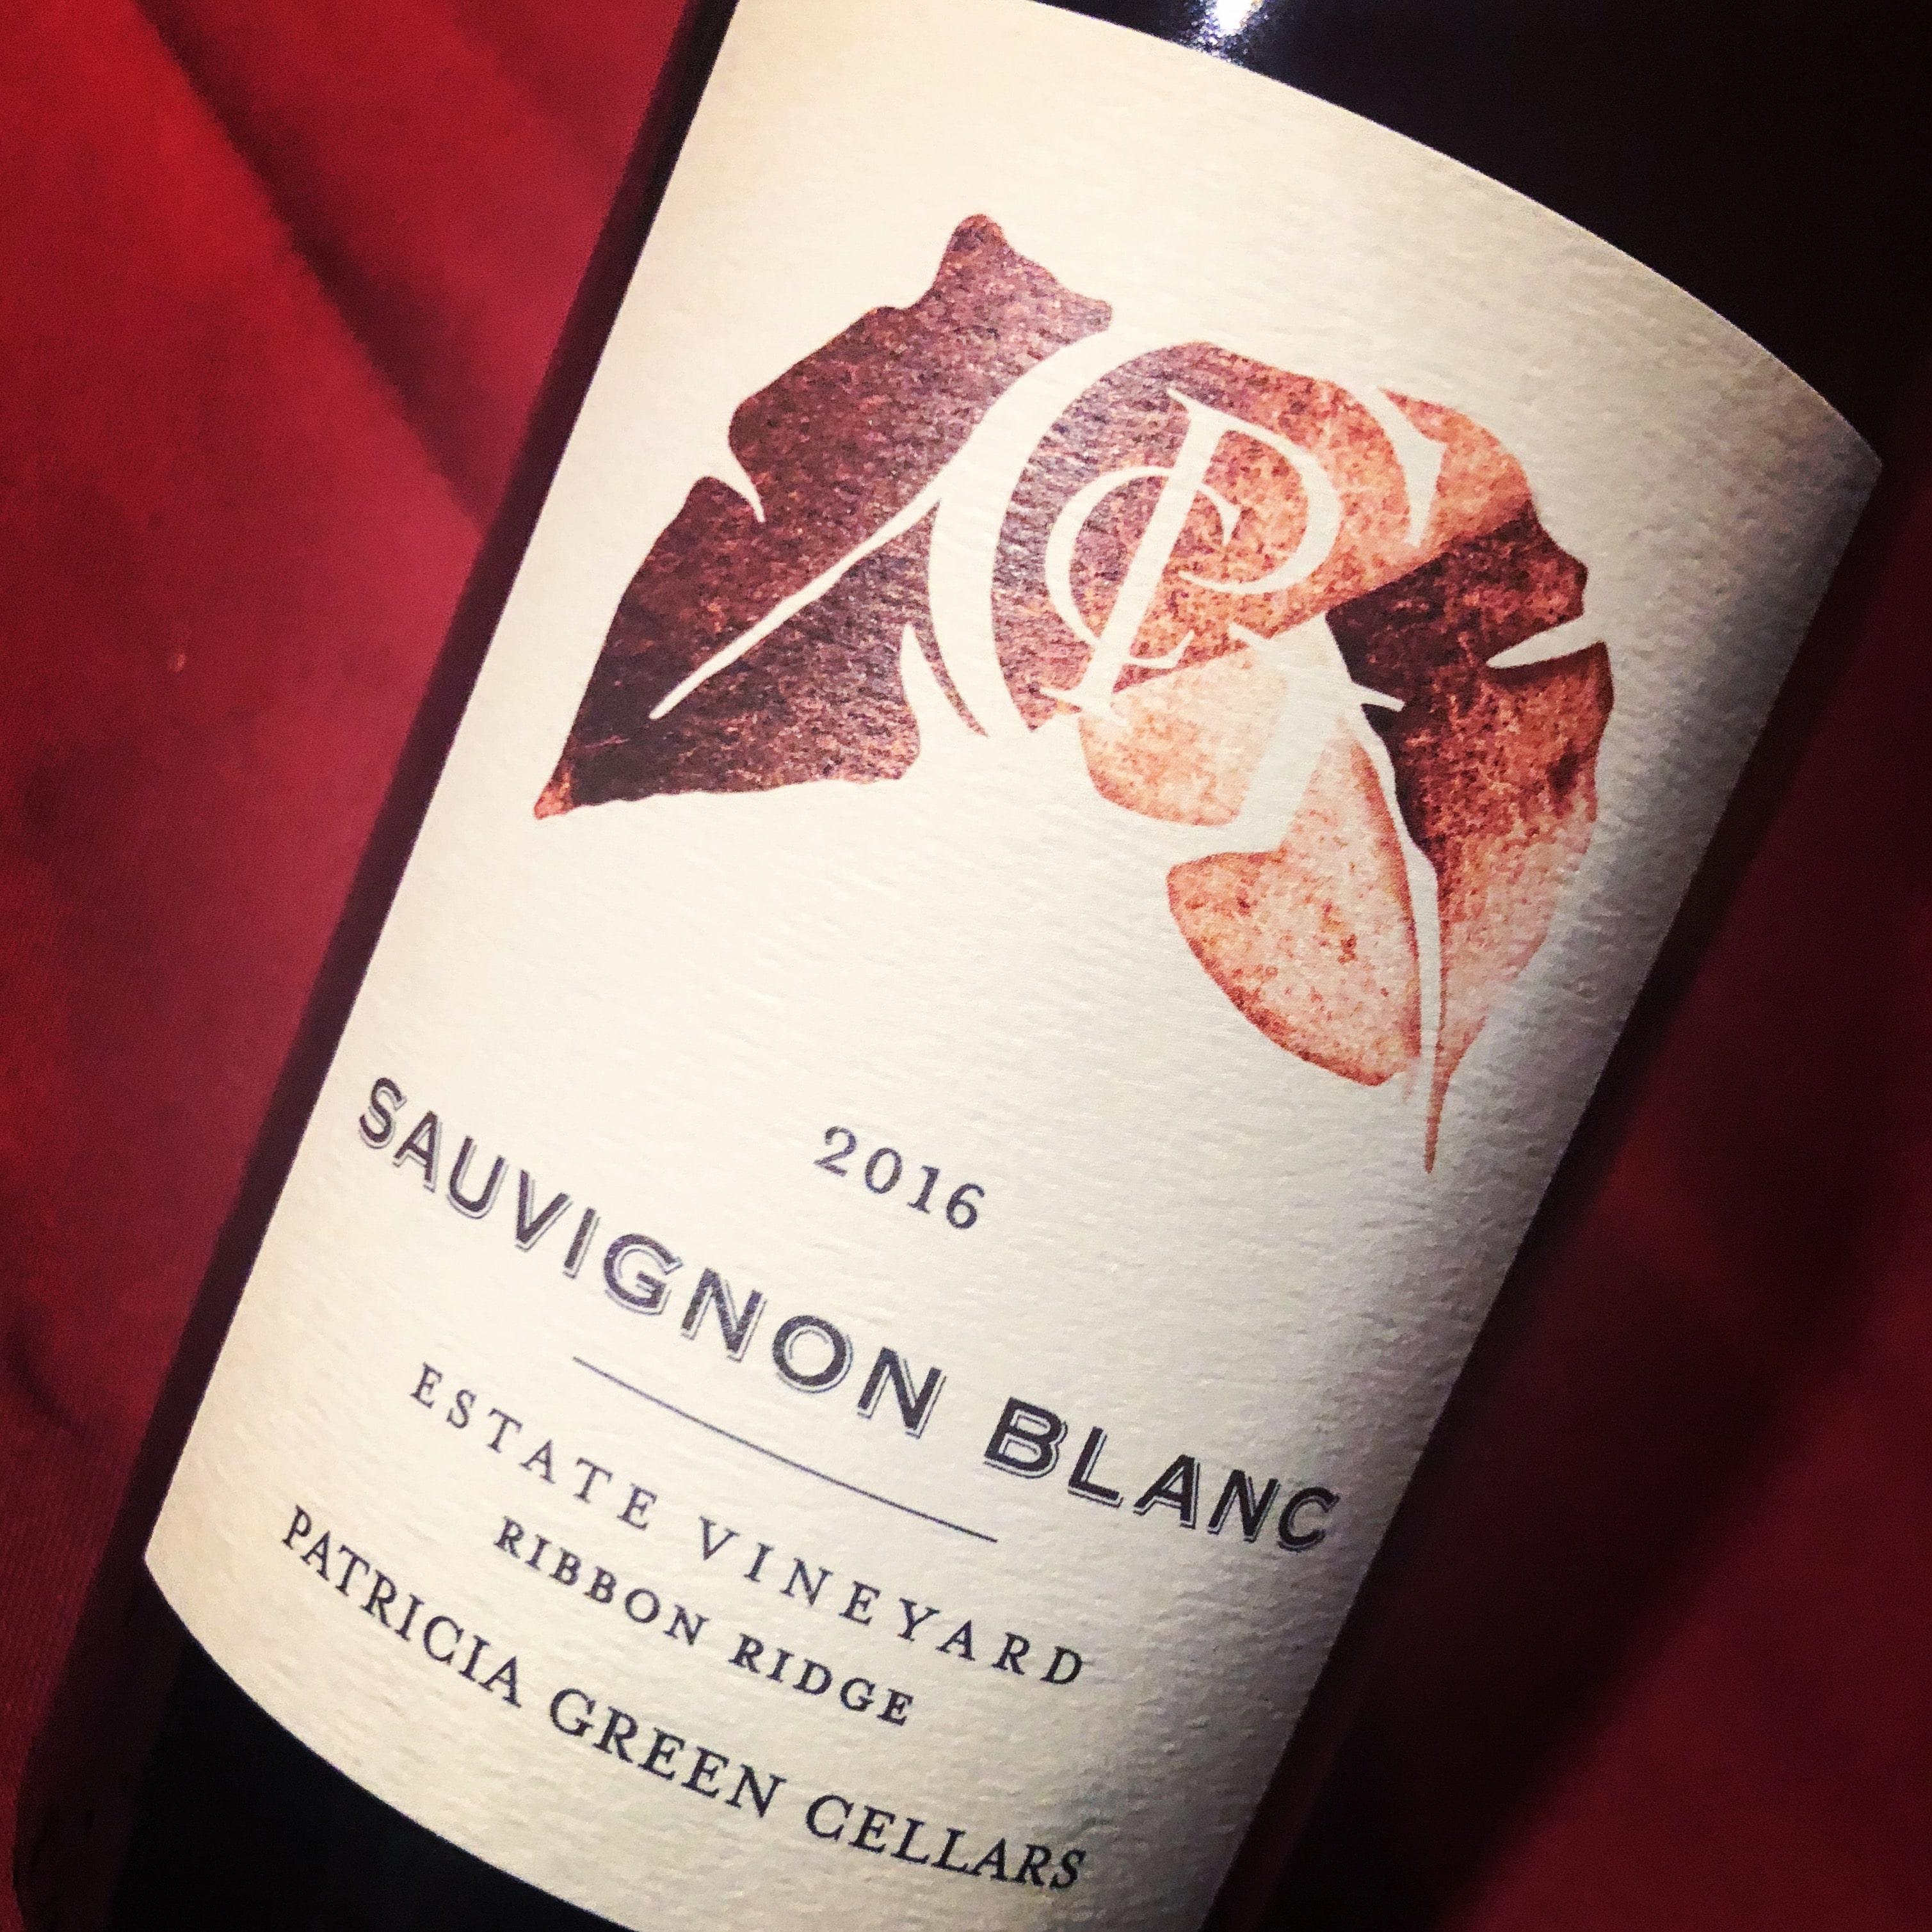 Patricia Green Cellars Sauvignon Blanc 2016